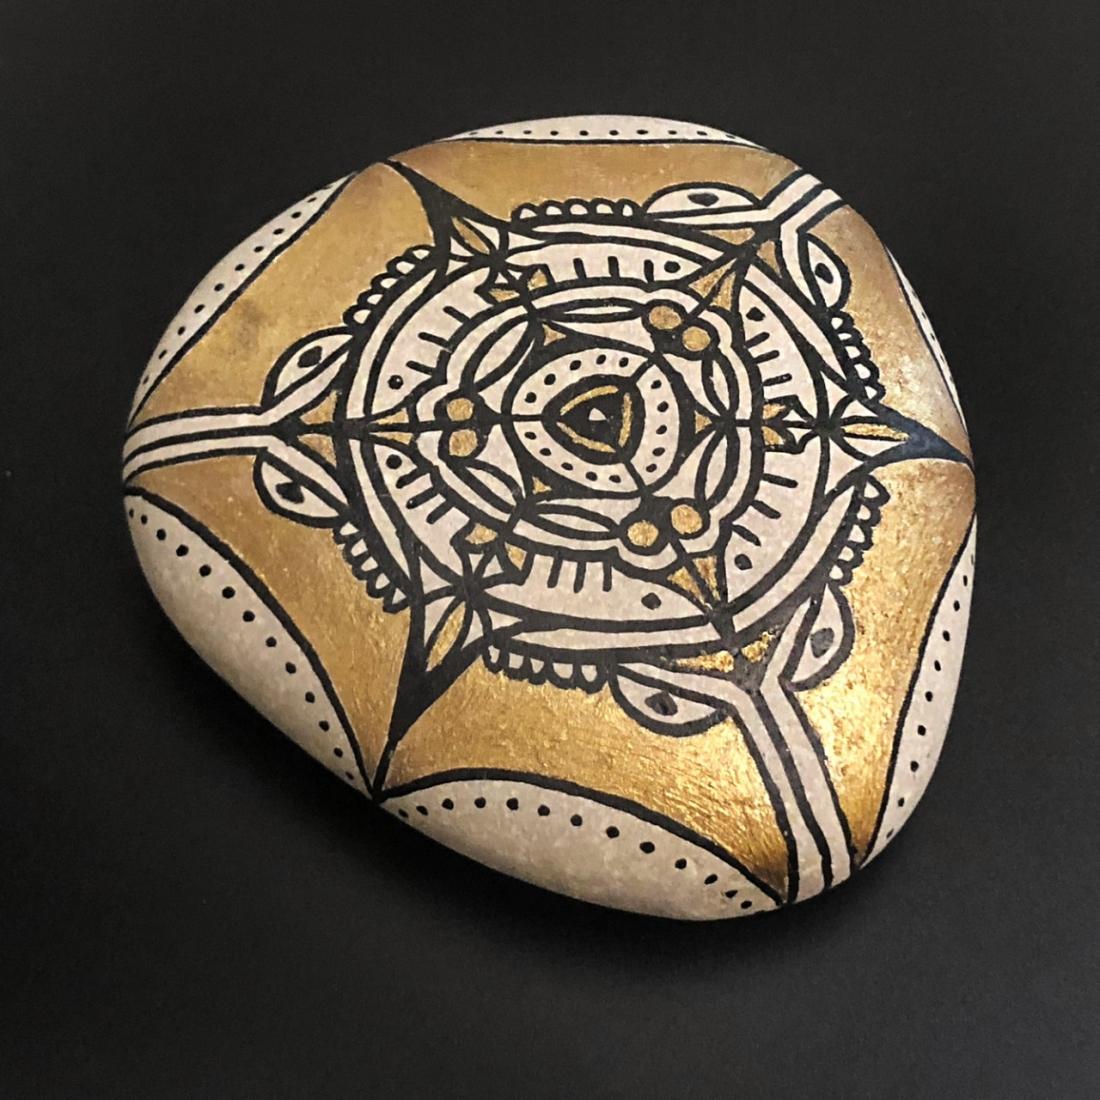 Arabesque Pebble Art 2